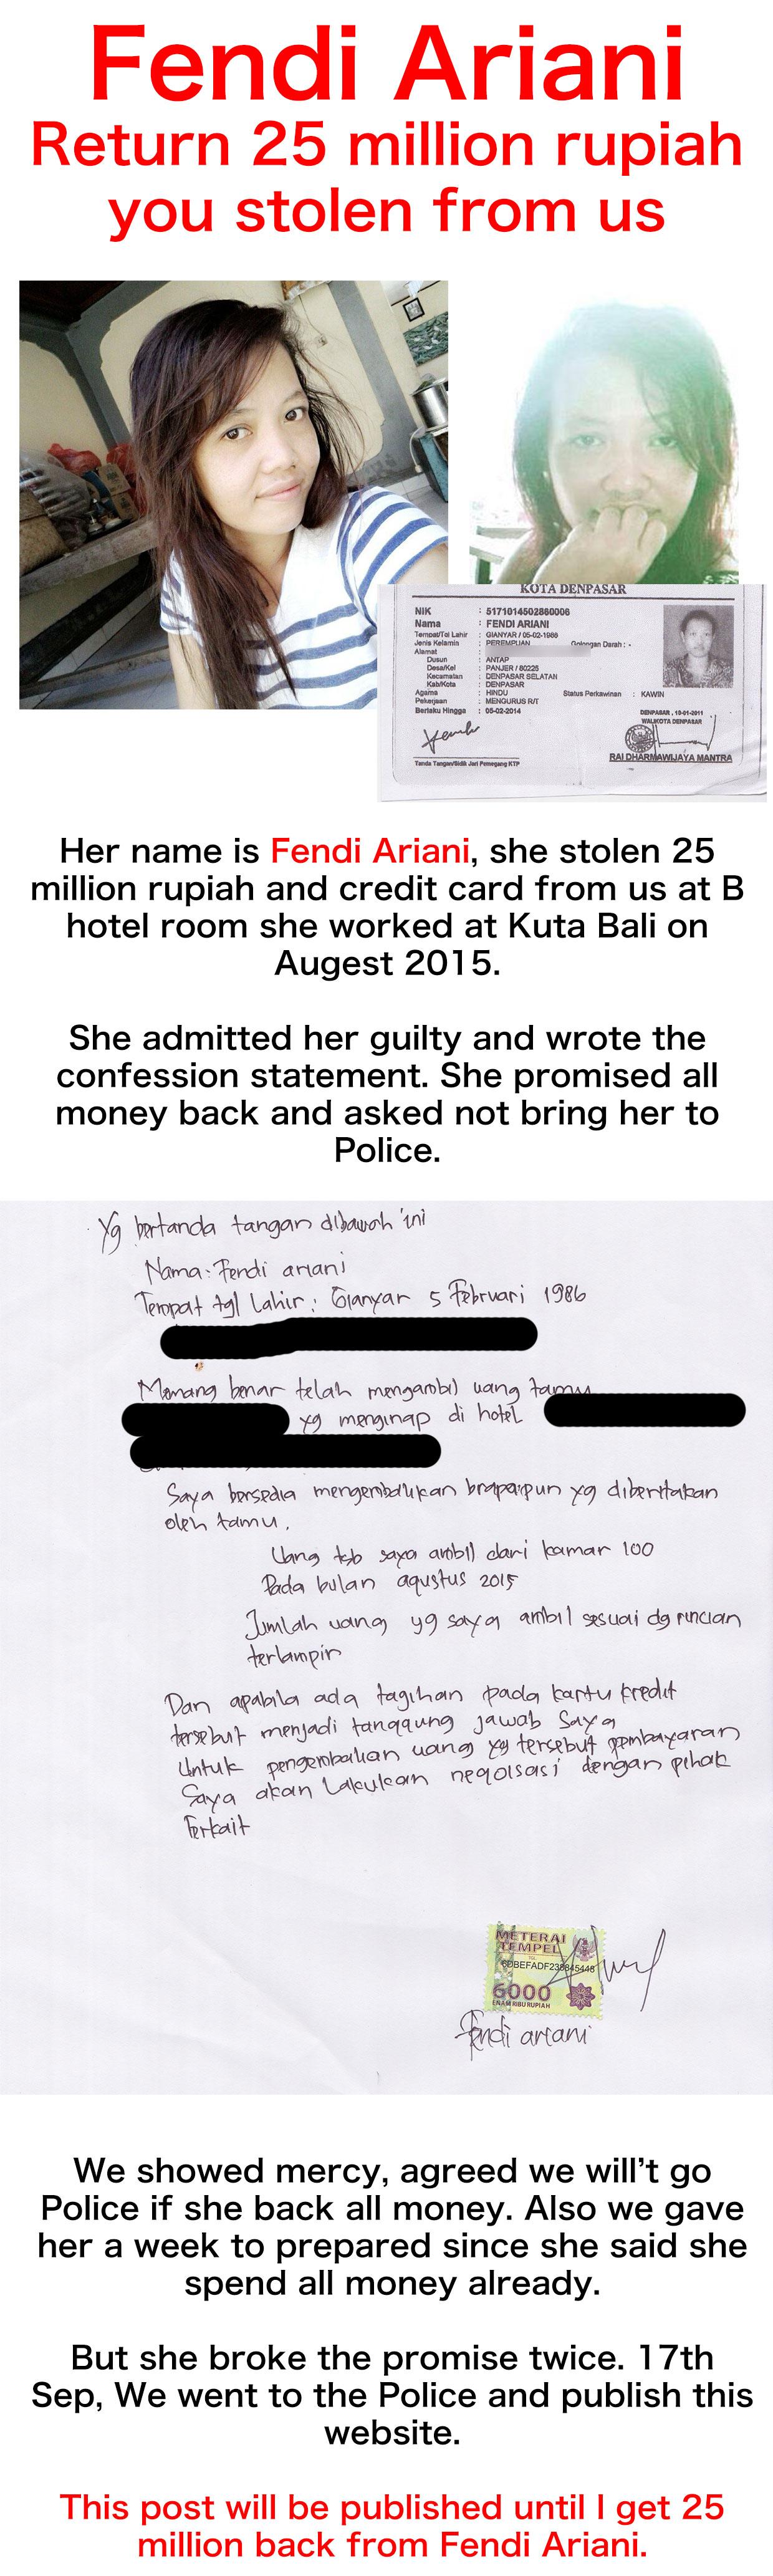 Thief in Bali – Fendi Ariani, who steal 25 million rupiah